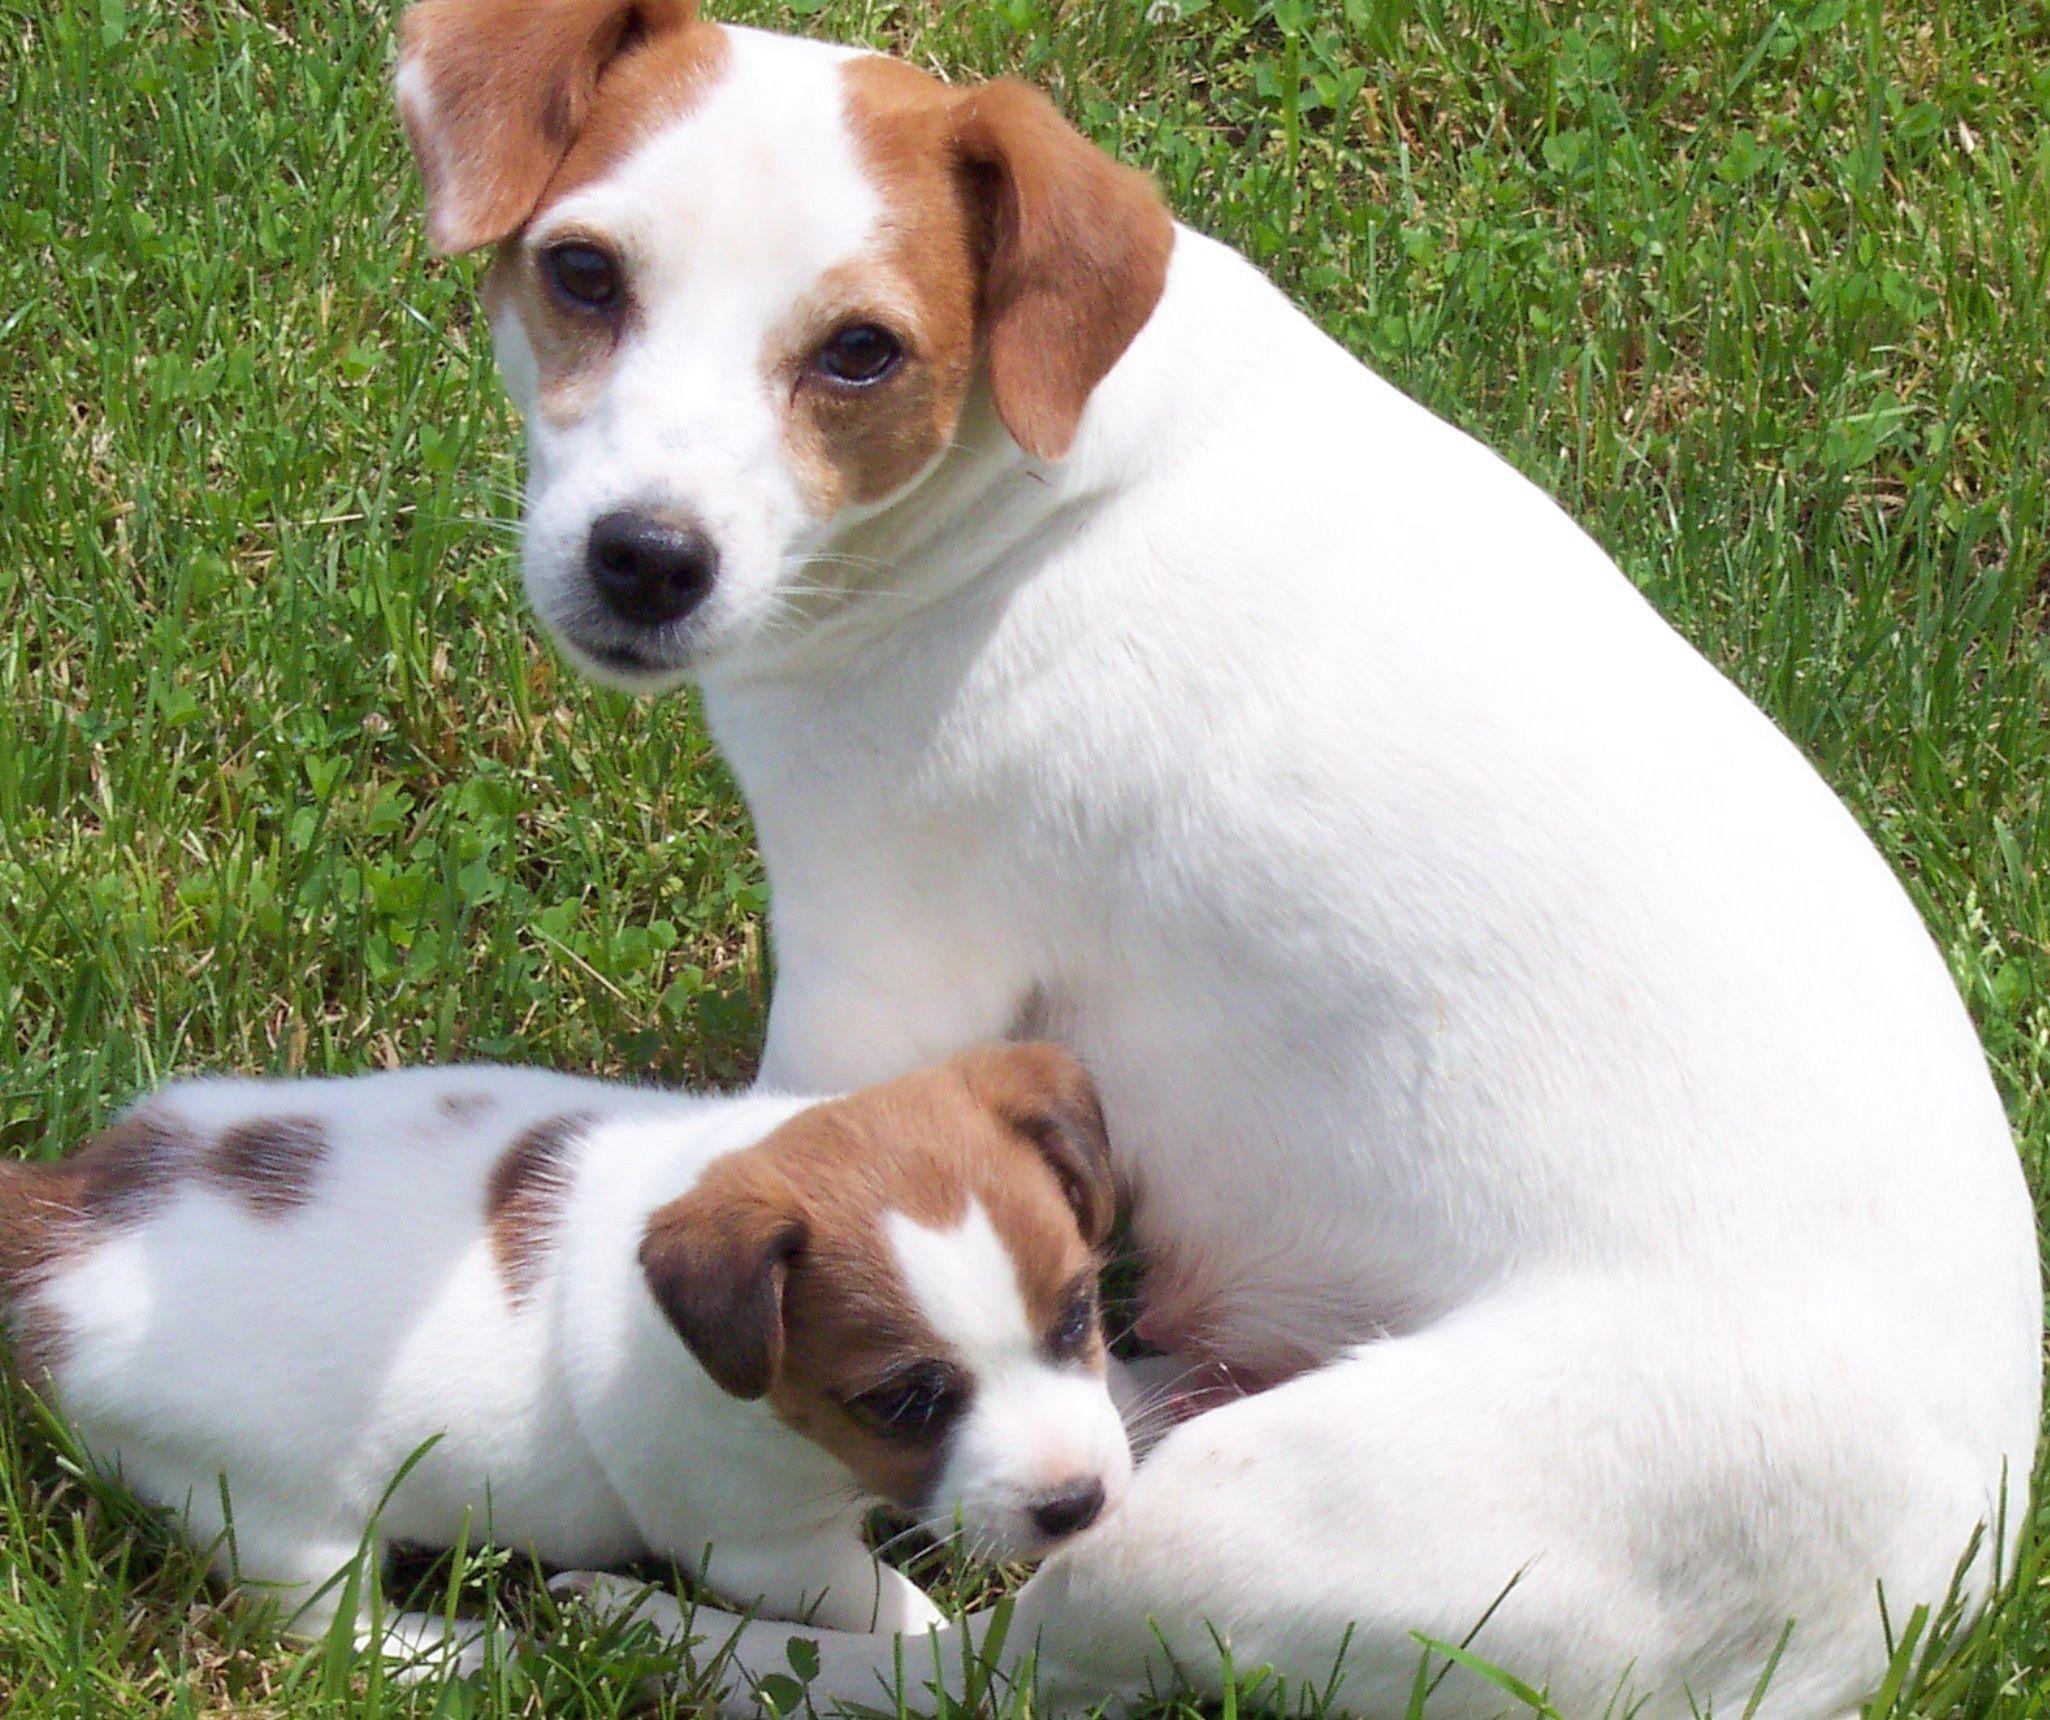 Jack Russell Terrier Puppies Dyas Farm Short Legged Jack Russell Terrier Puppies Jack Russell Jack Russell Terrier Puppies Jack Russell Dogs